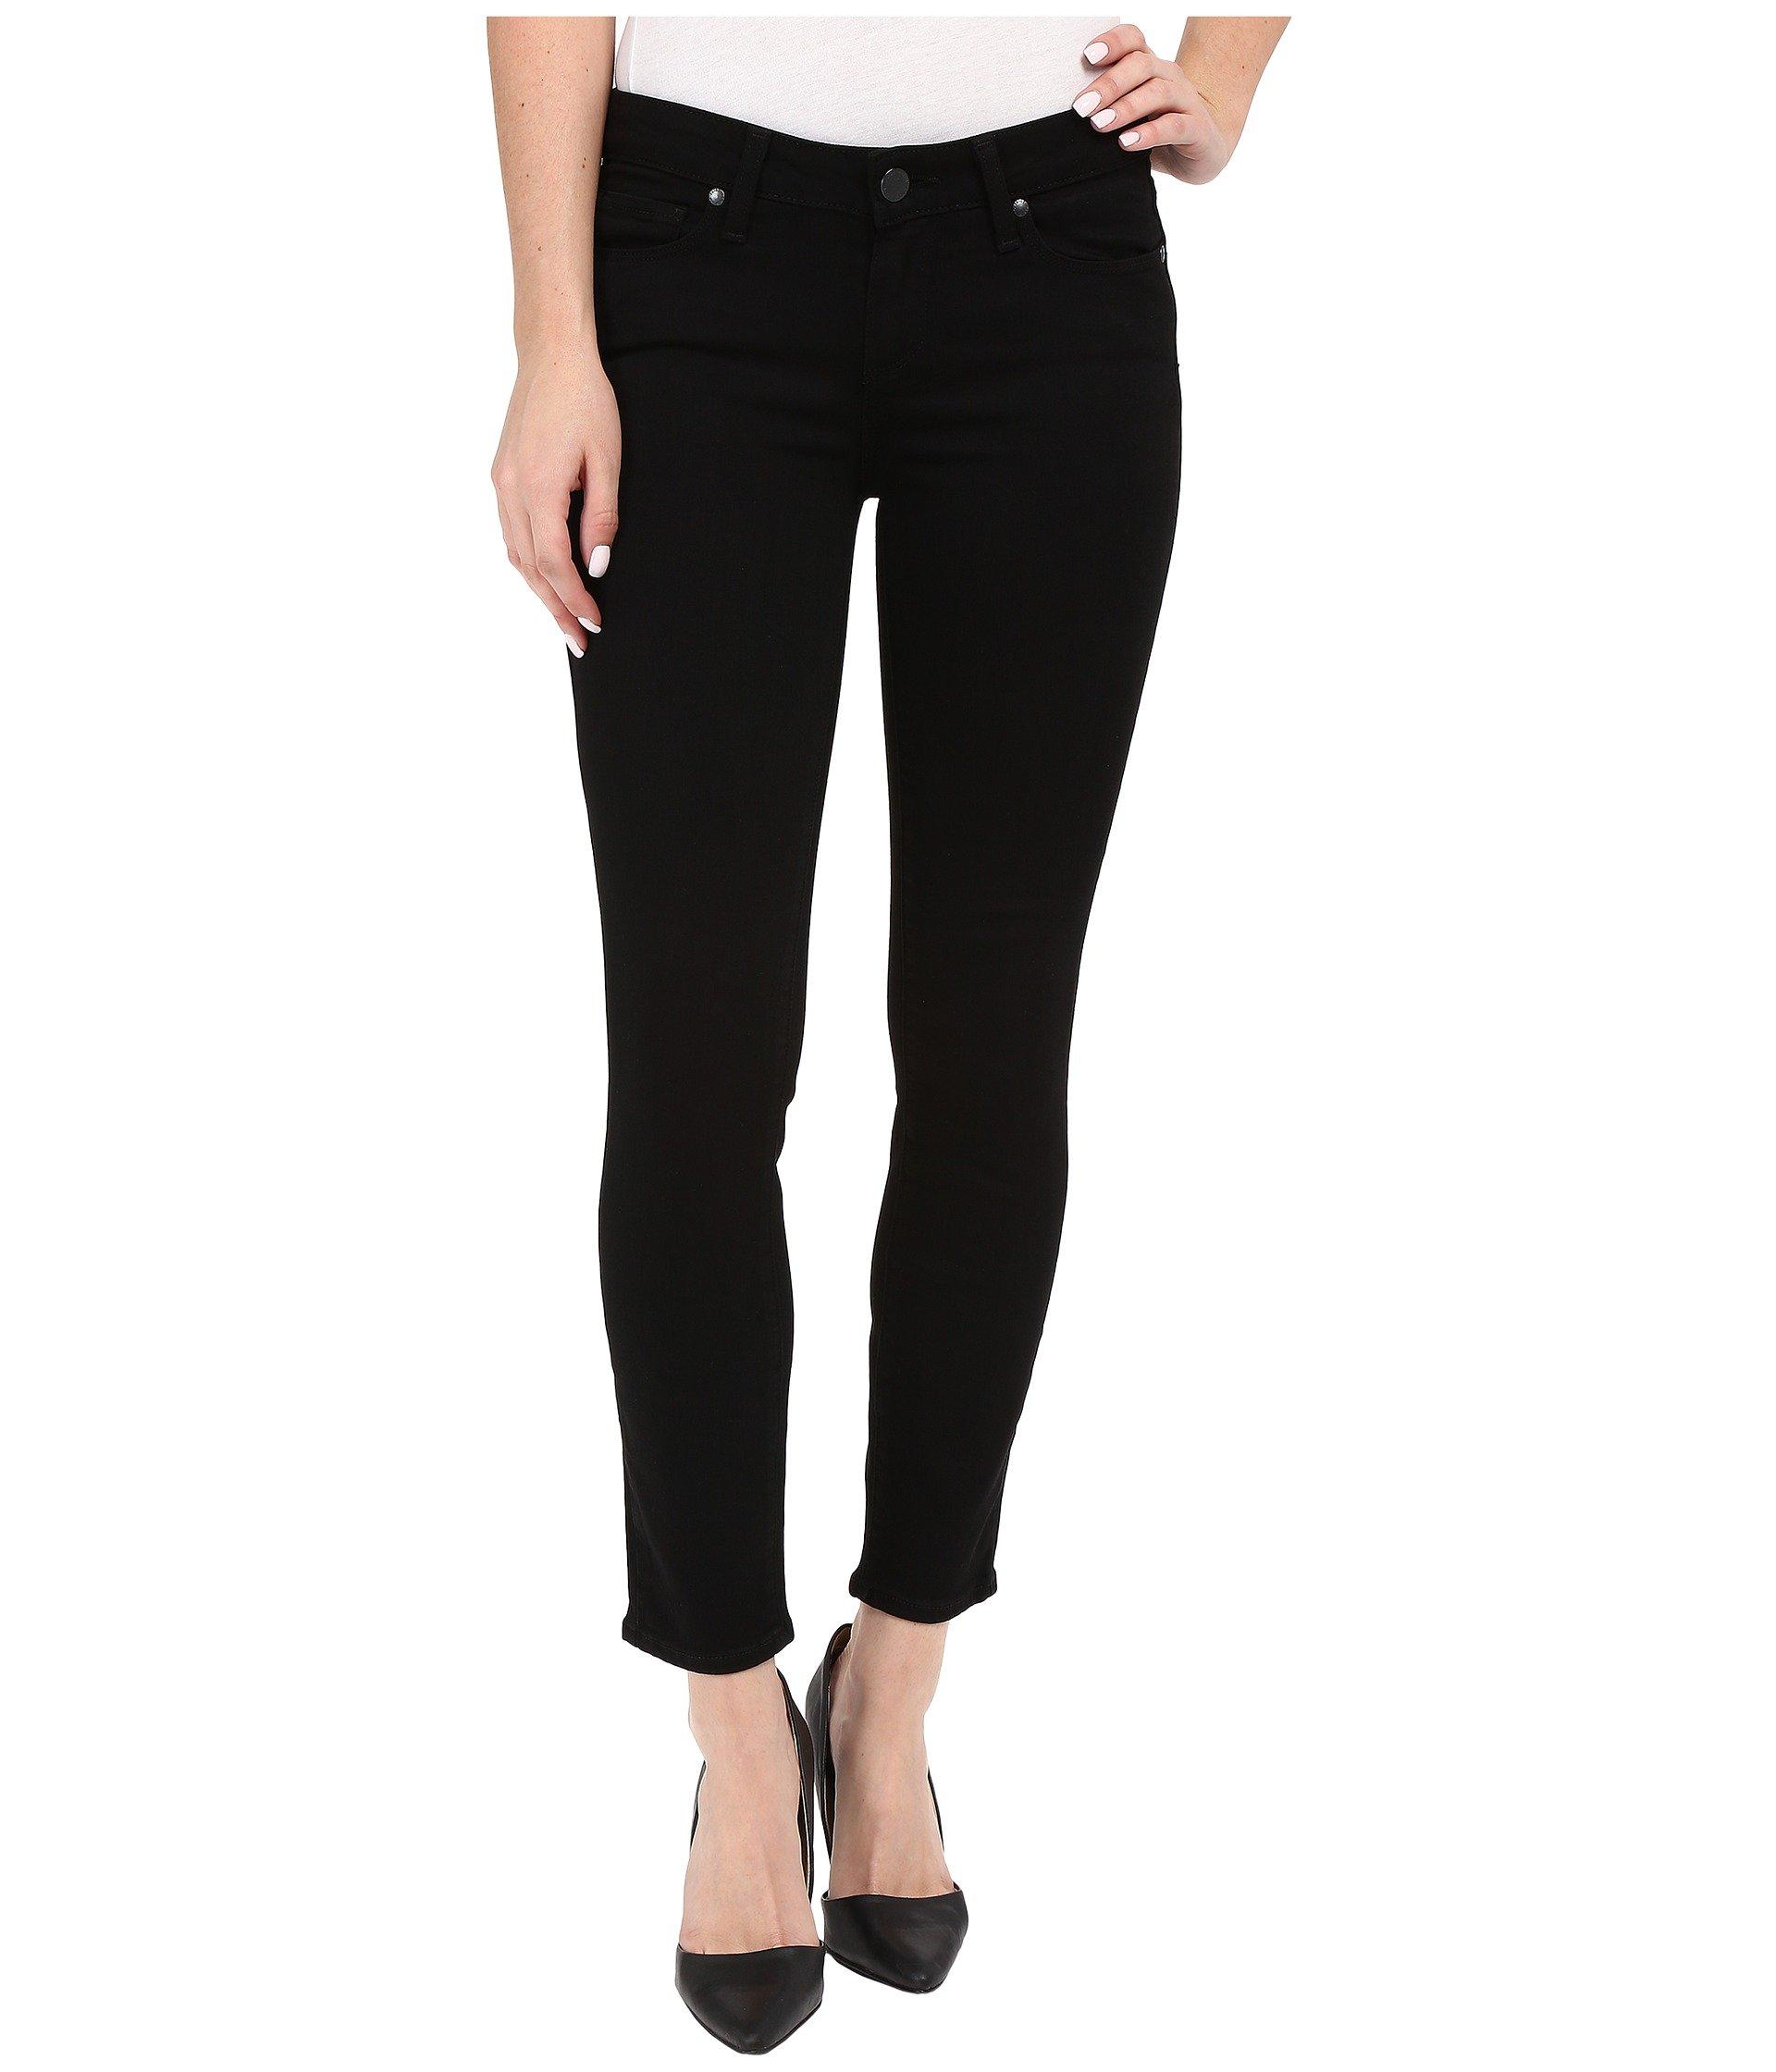 black verdugo jeans, paige verdugo black